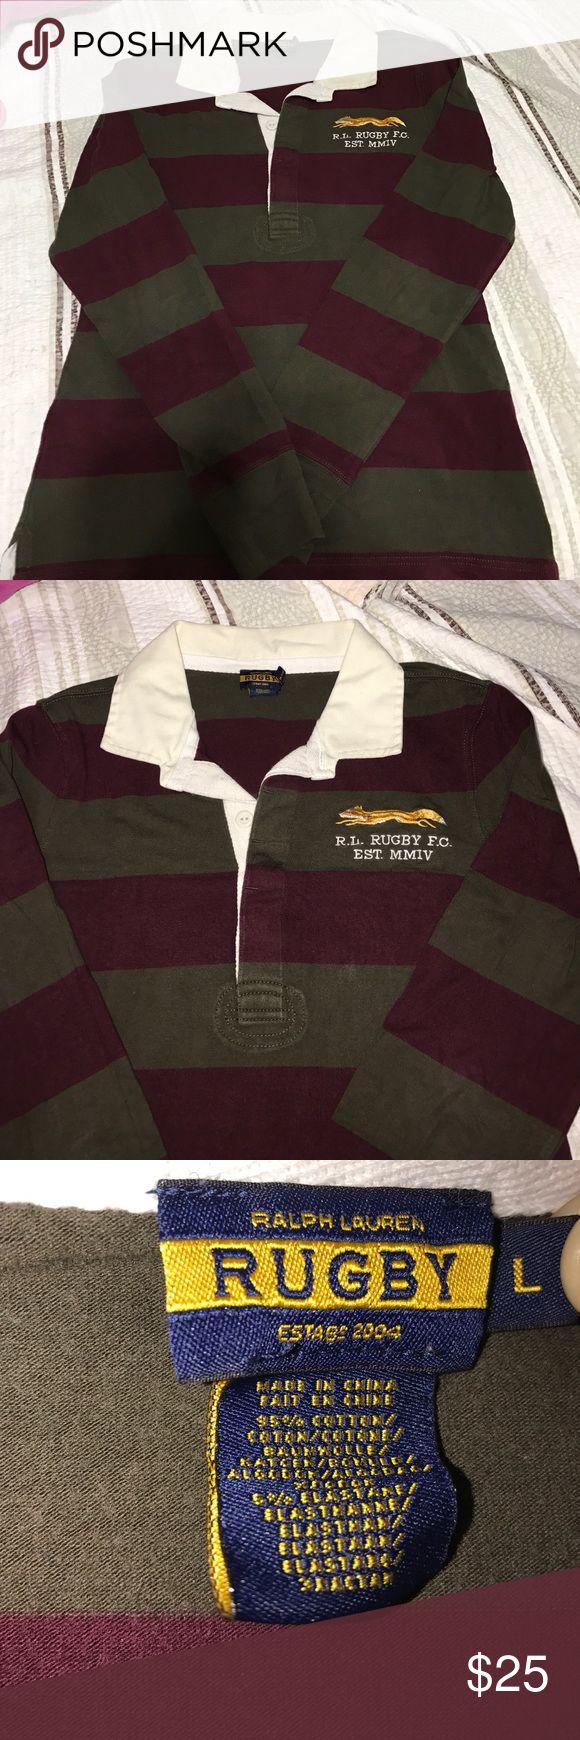 "Ralph Lauren ""RUGBY"" Shirt Women Rugby Shirt. Pre-owned classic shirt. Green/ Maroon Stripe Fox logo polo long sleeve shirt. Ralph Lauren Rugby  Tops"